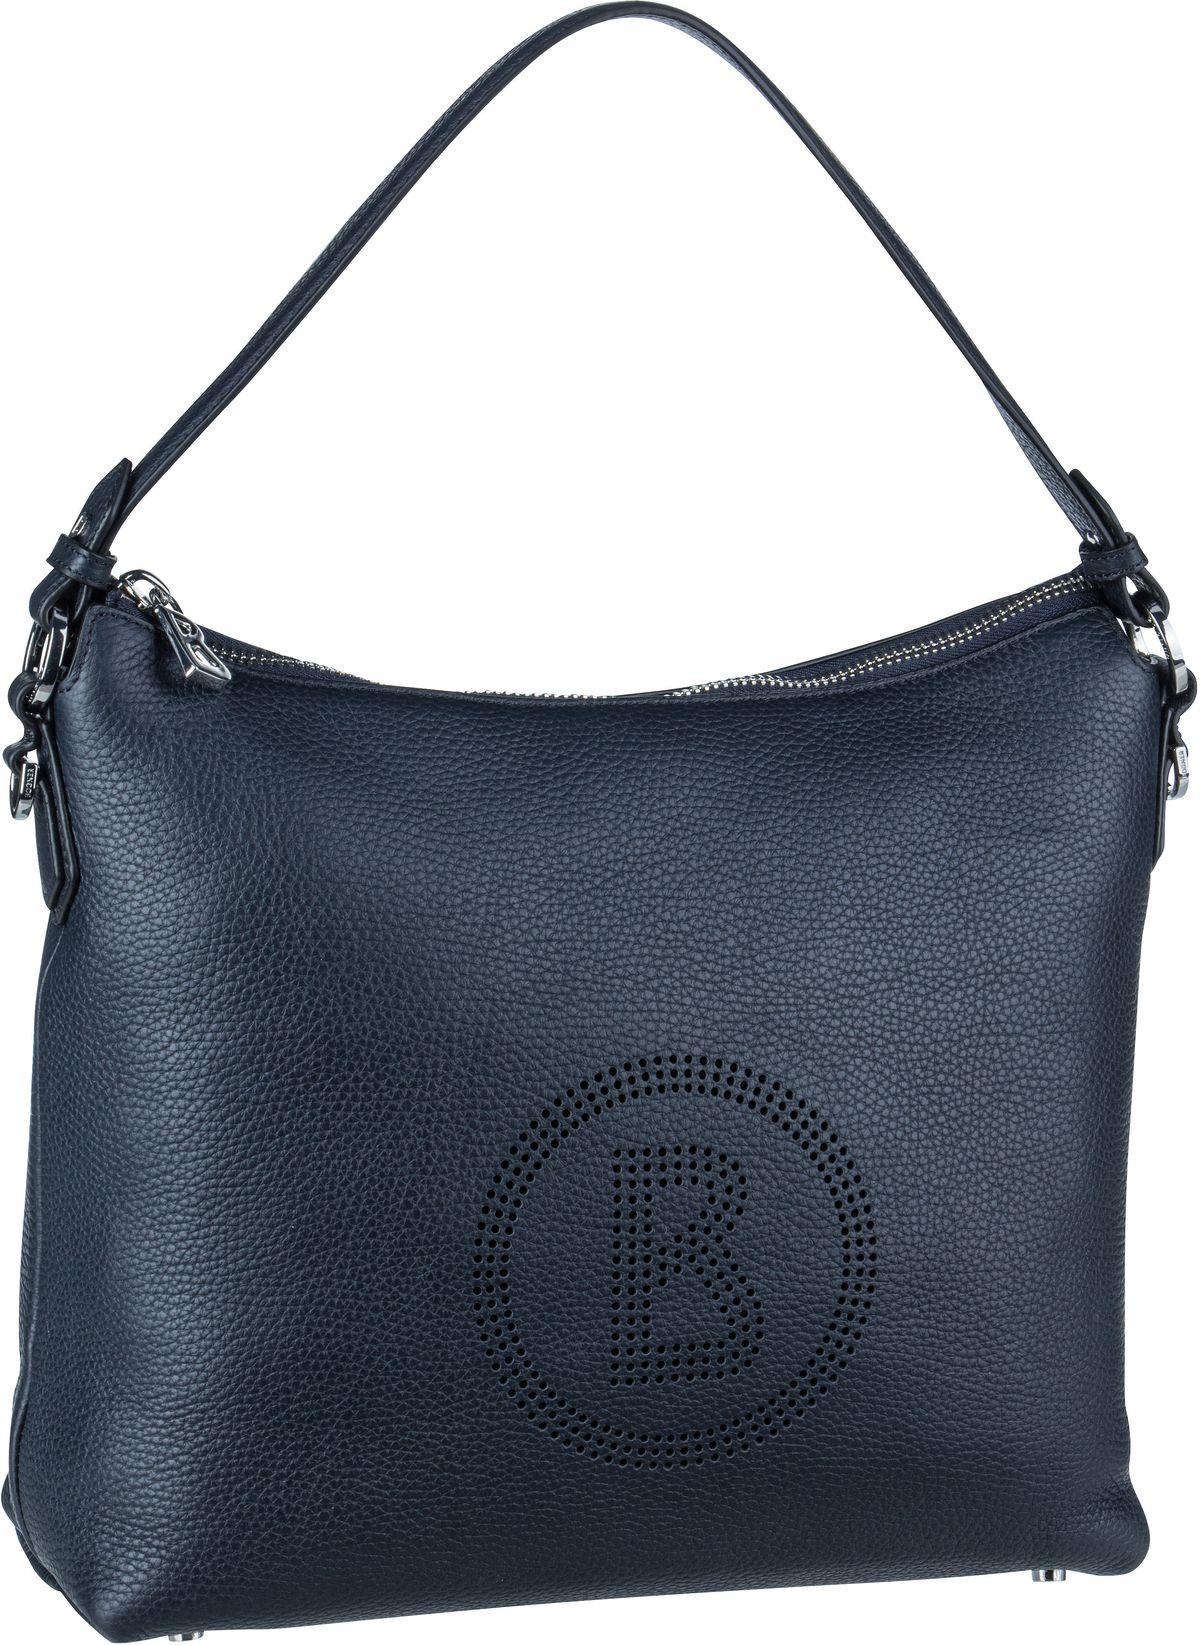 Handtasche Sulden Marie Hobo MHZ Dark Blue